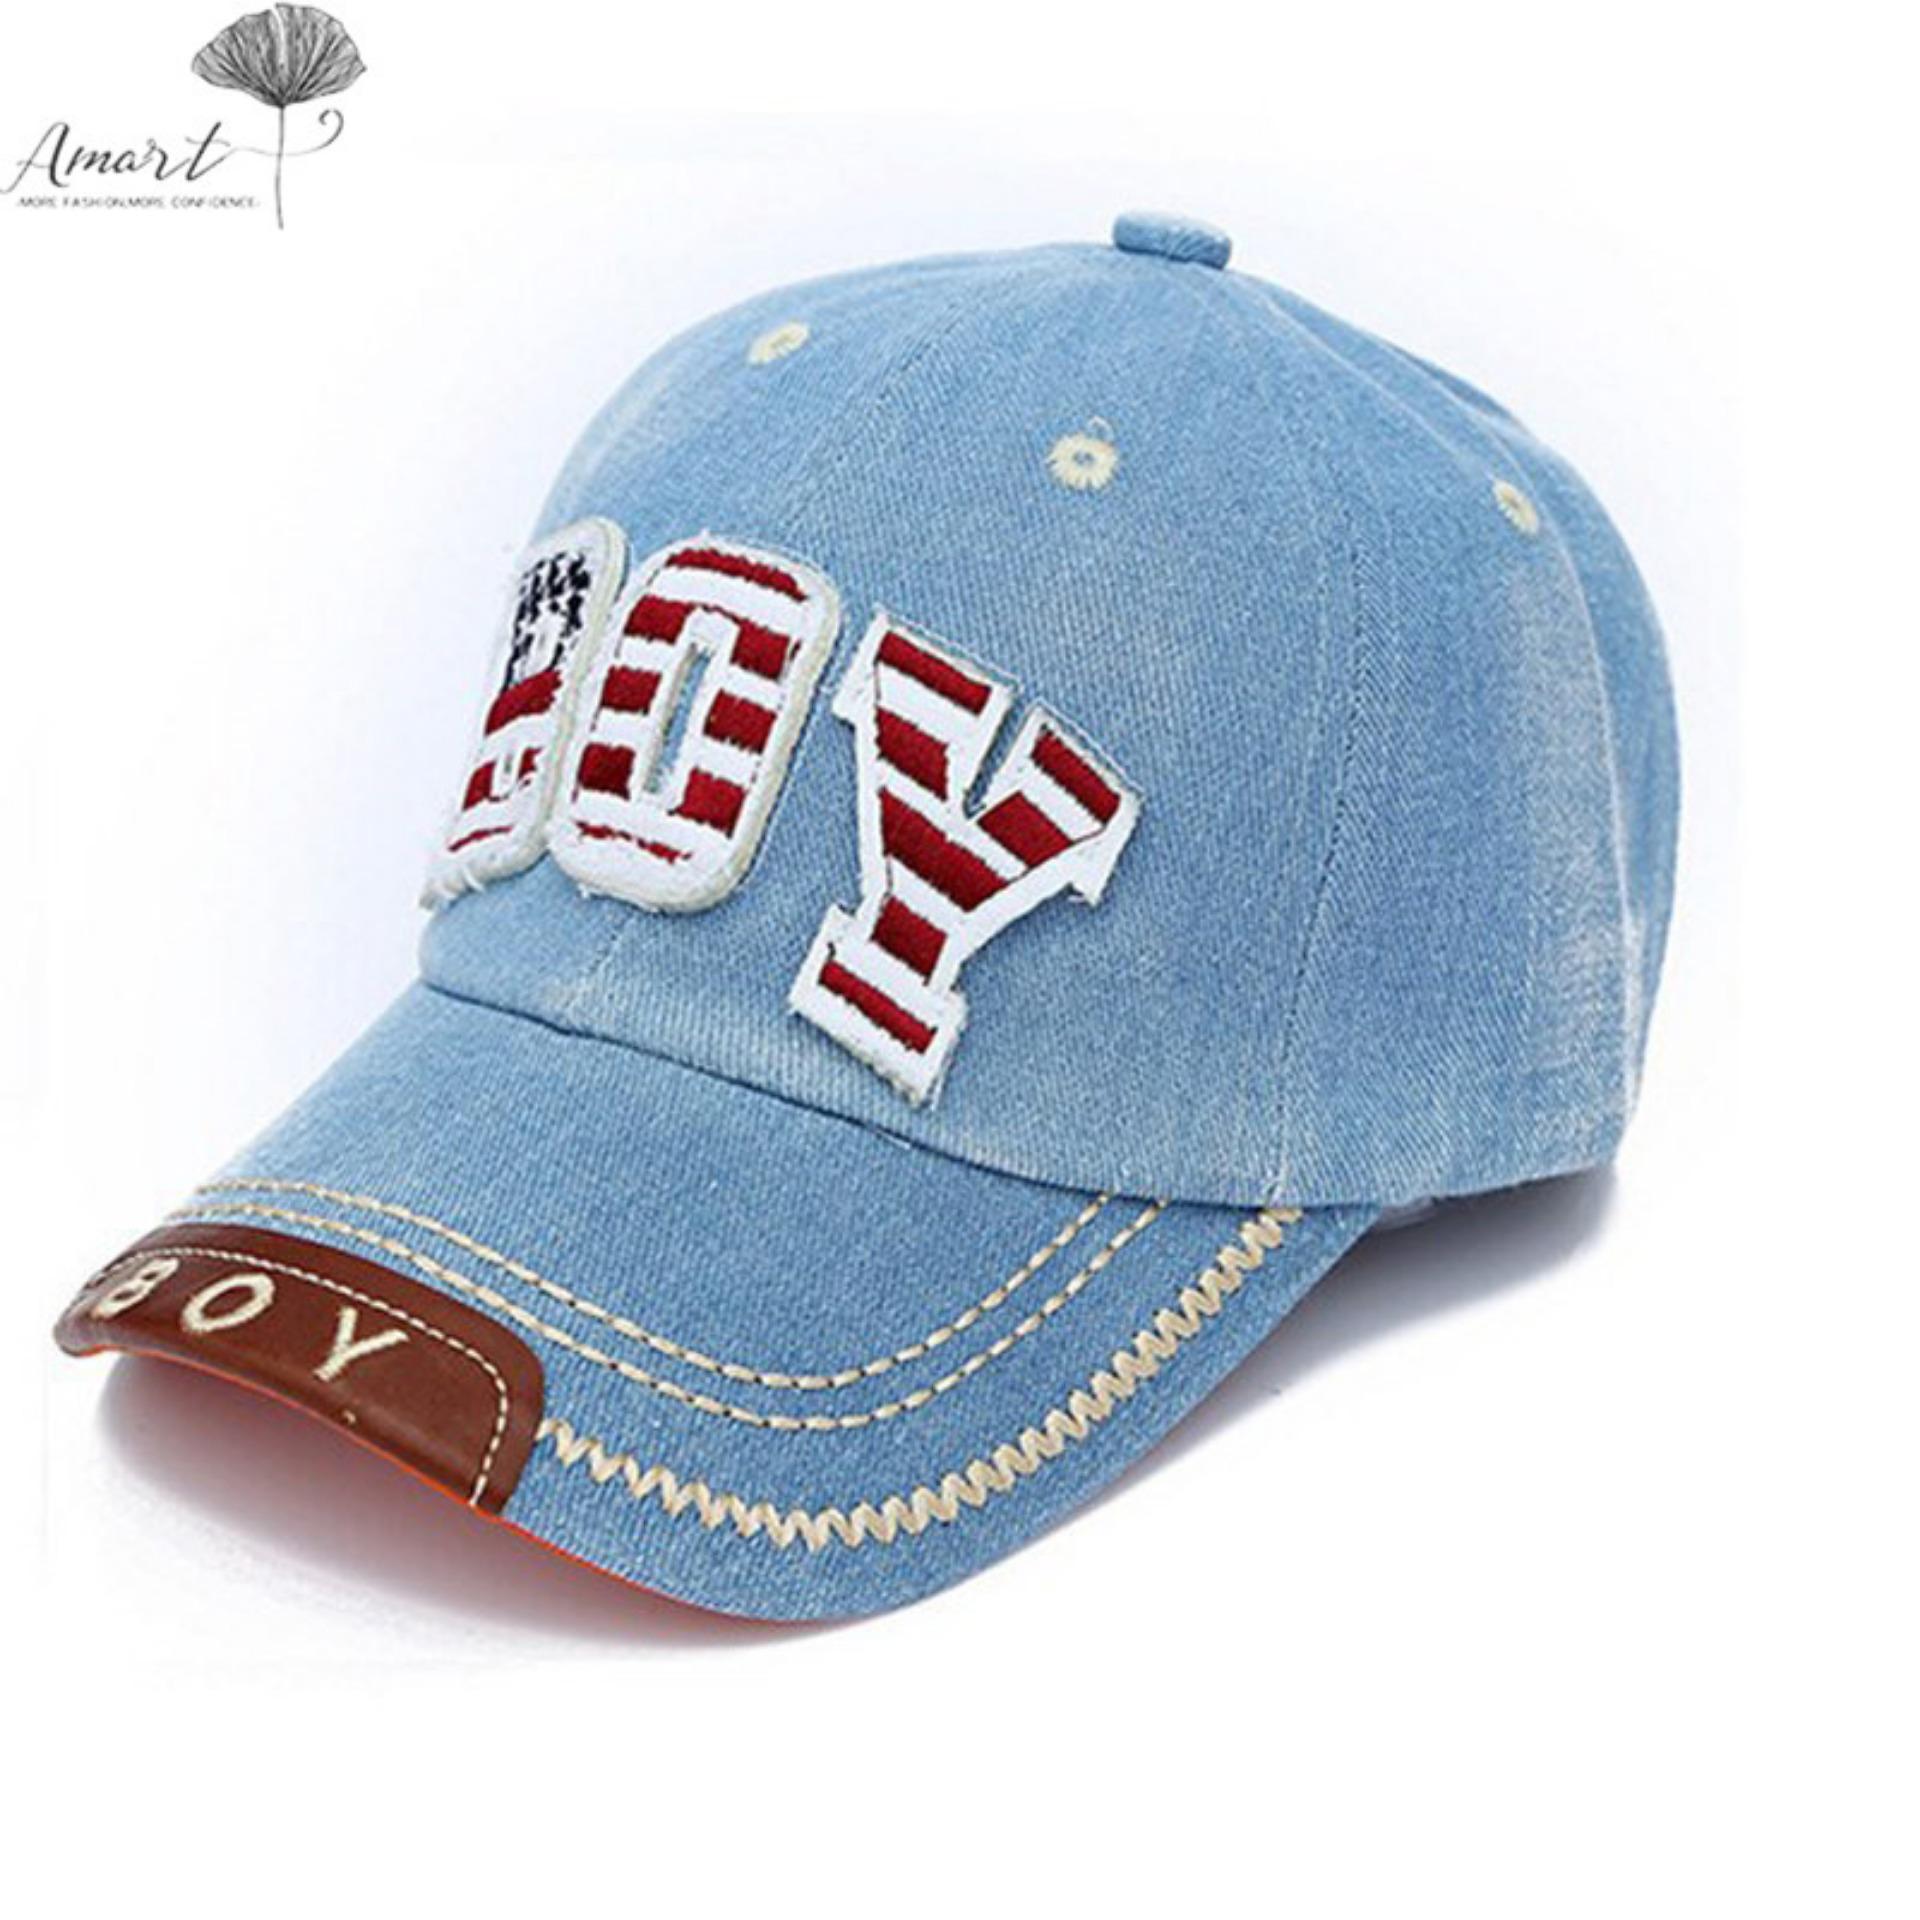 Amart Topi Baseball Koboi Anak-anak yang Bisa Disesuaikan (Biru Muda) | Lazada Indonesia